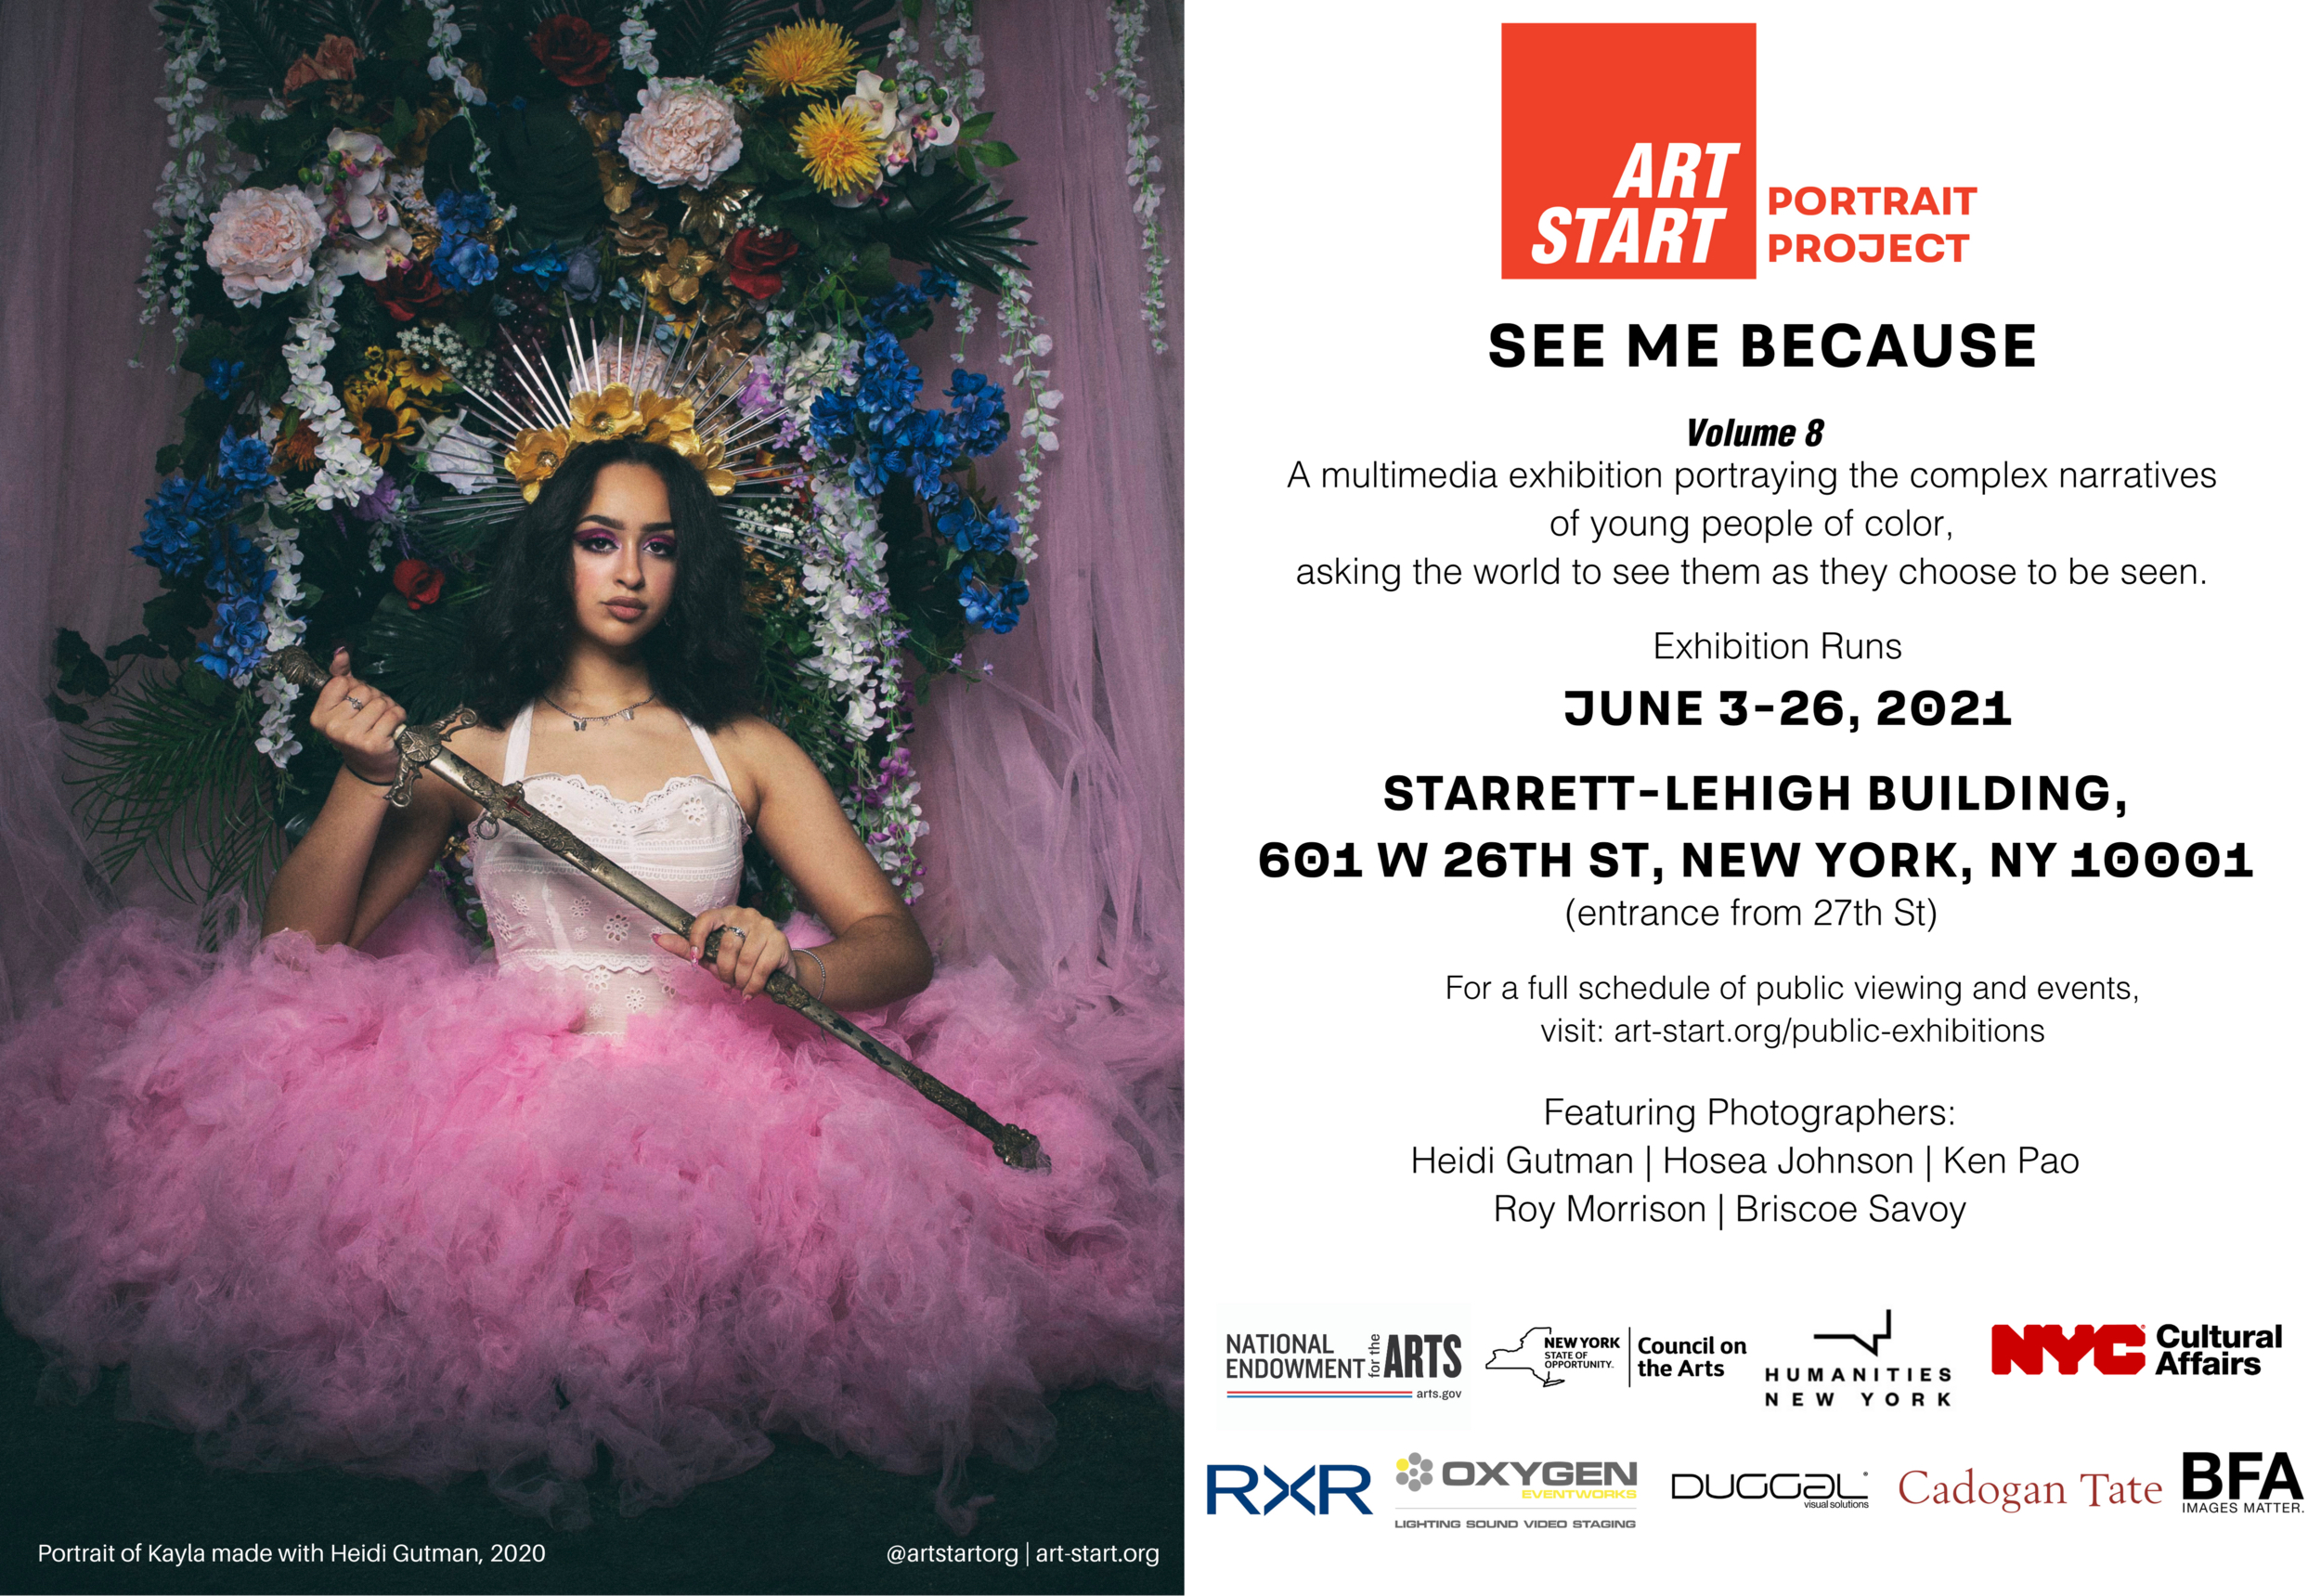 Art Start: See Me Because Vol 8 at Starrett-Lehigh